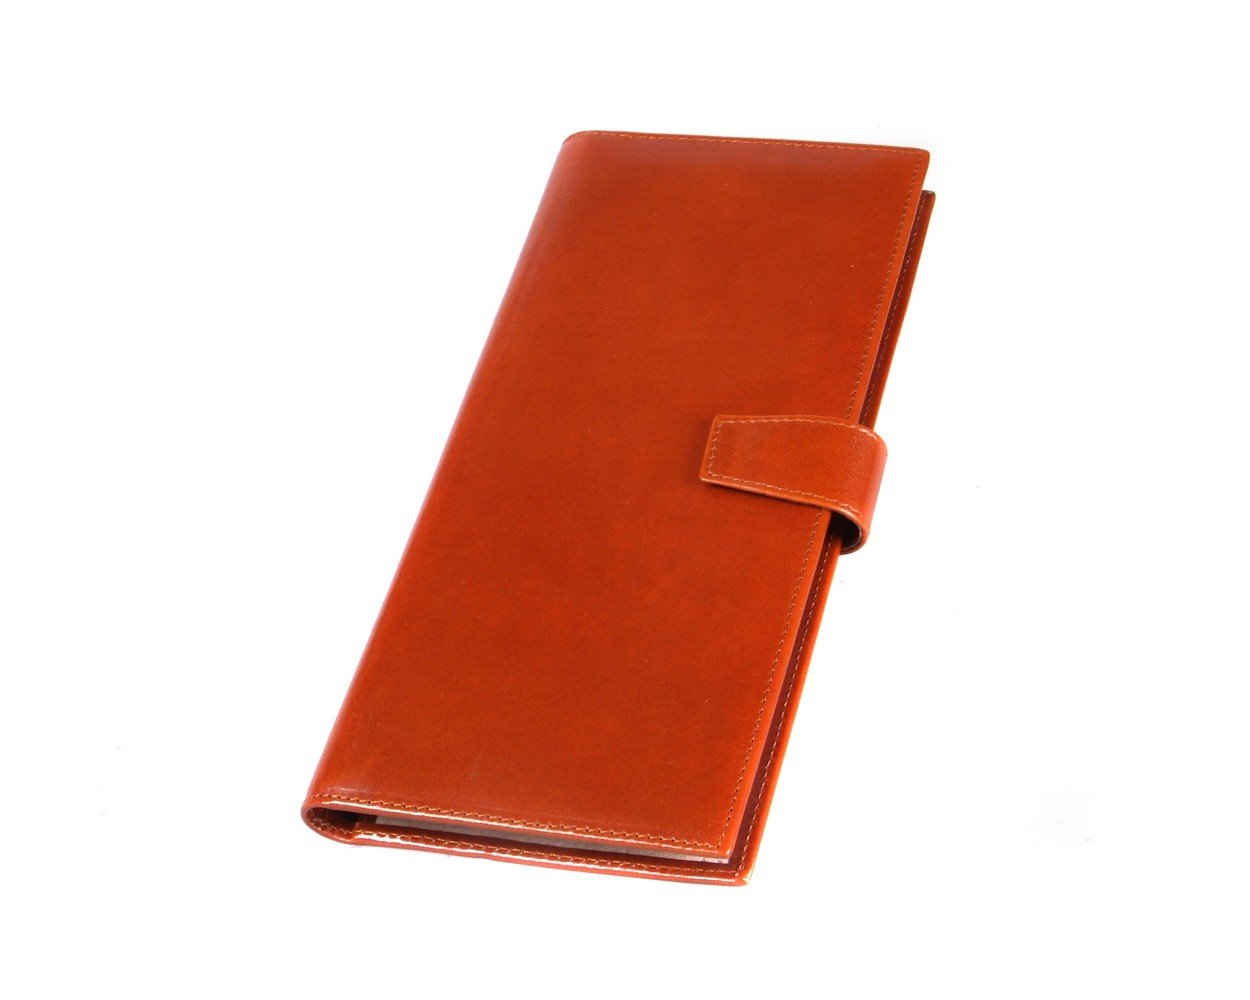 SAGEBROWN Havana Tan Multiple Business Card Wallet